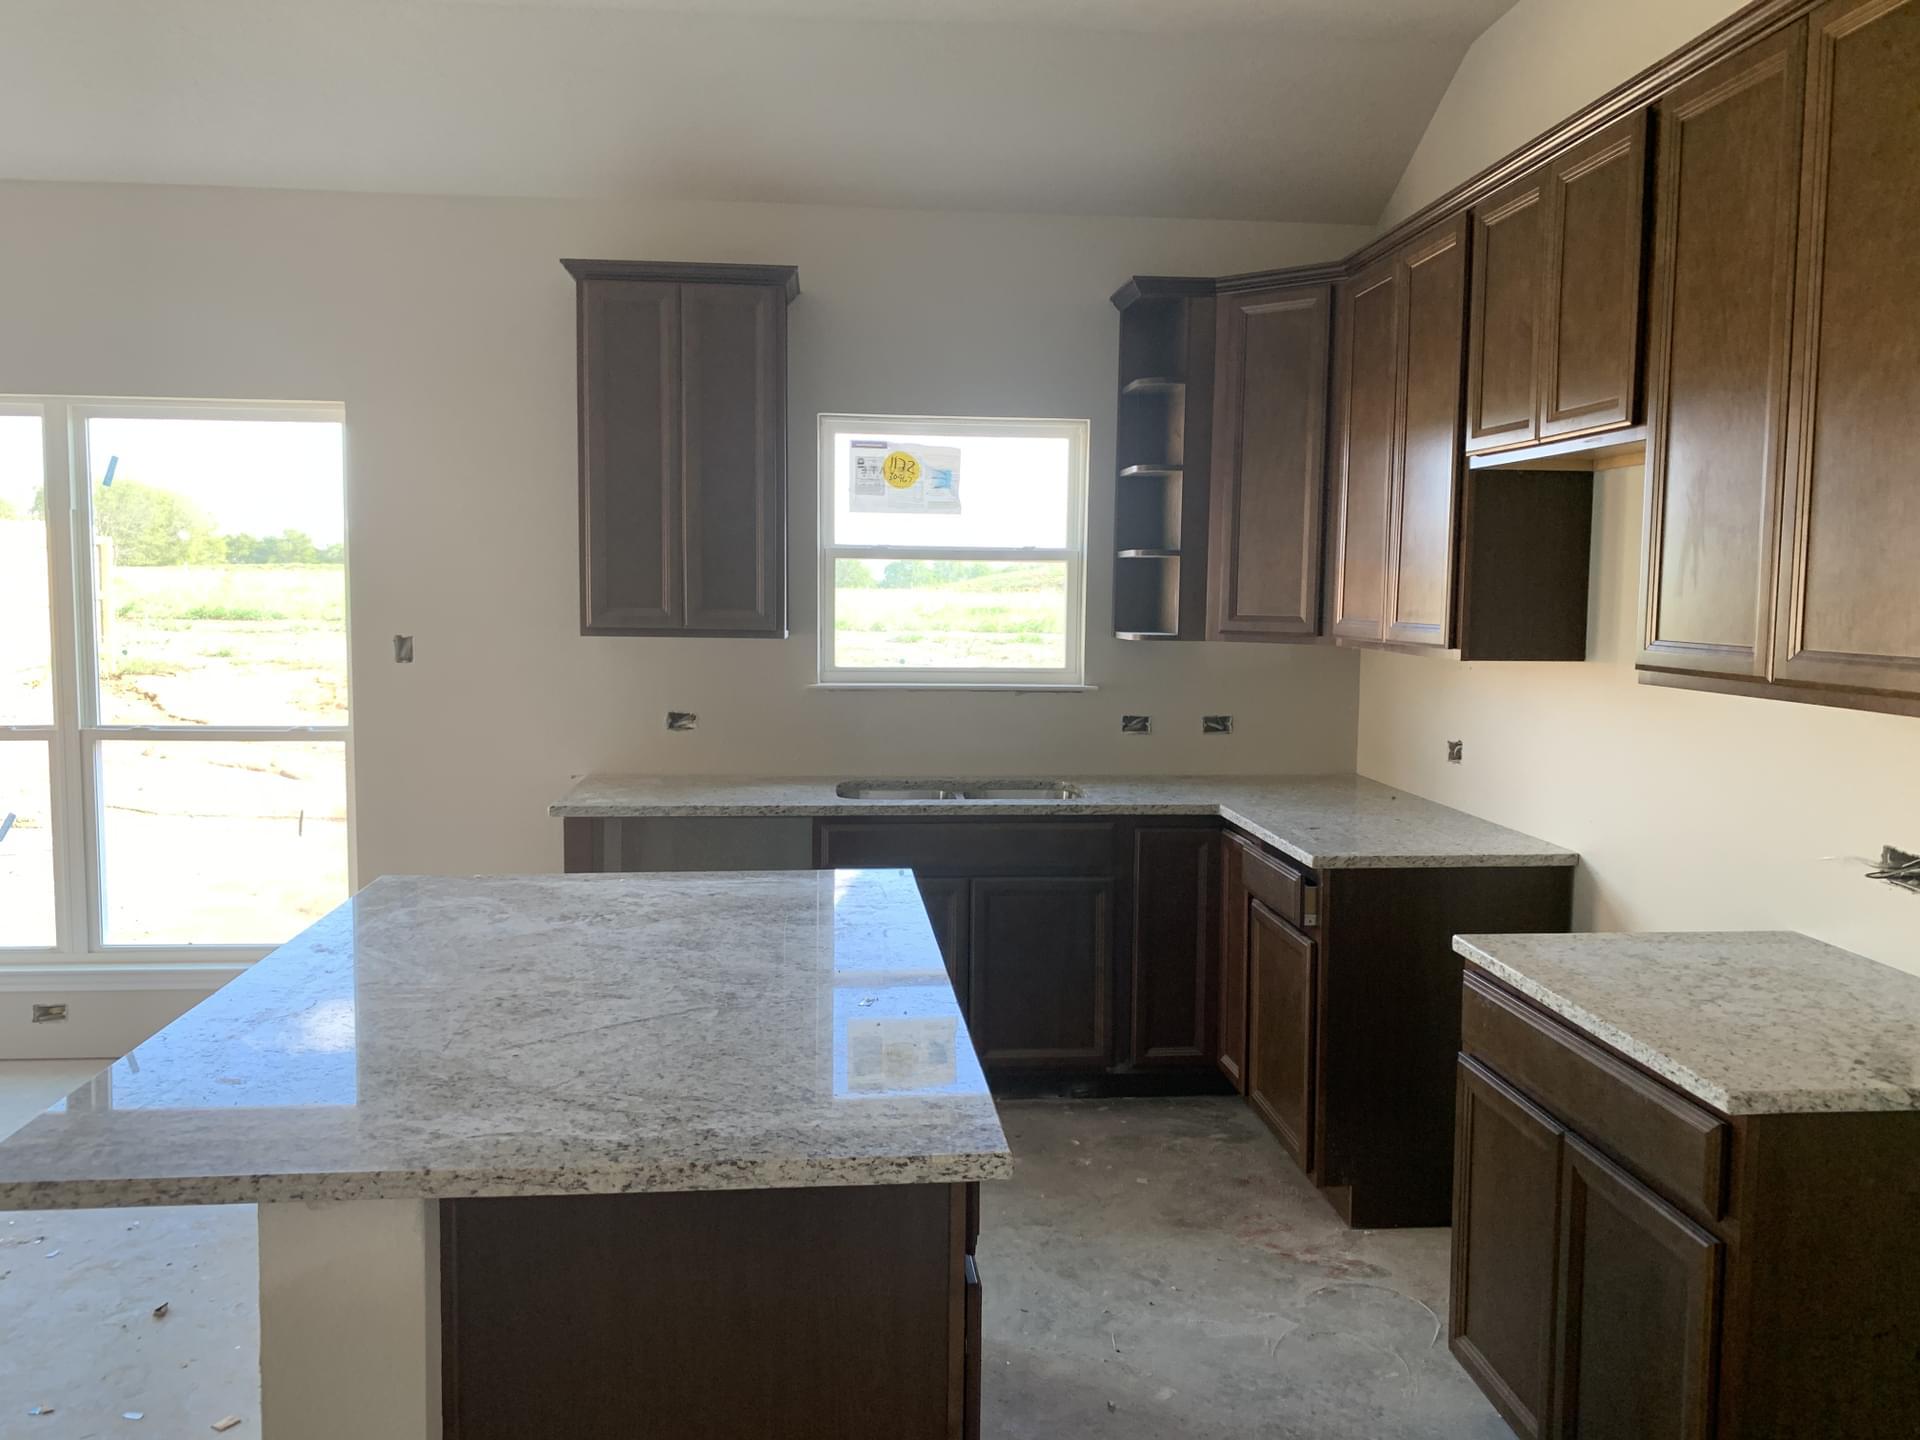 1,517sf New Home in Caldwell, TX